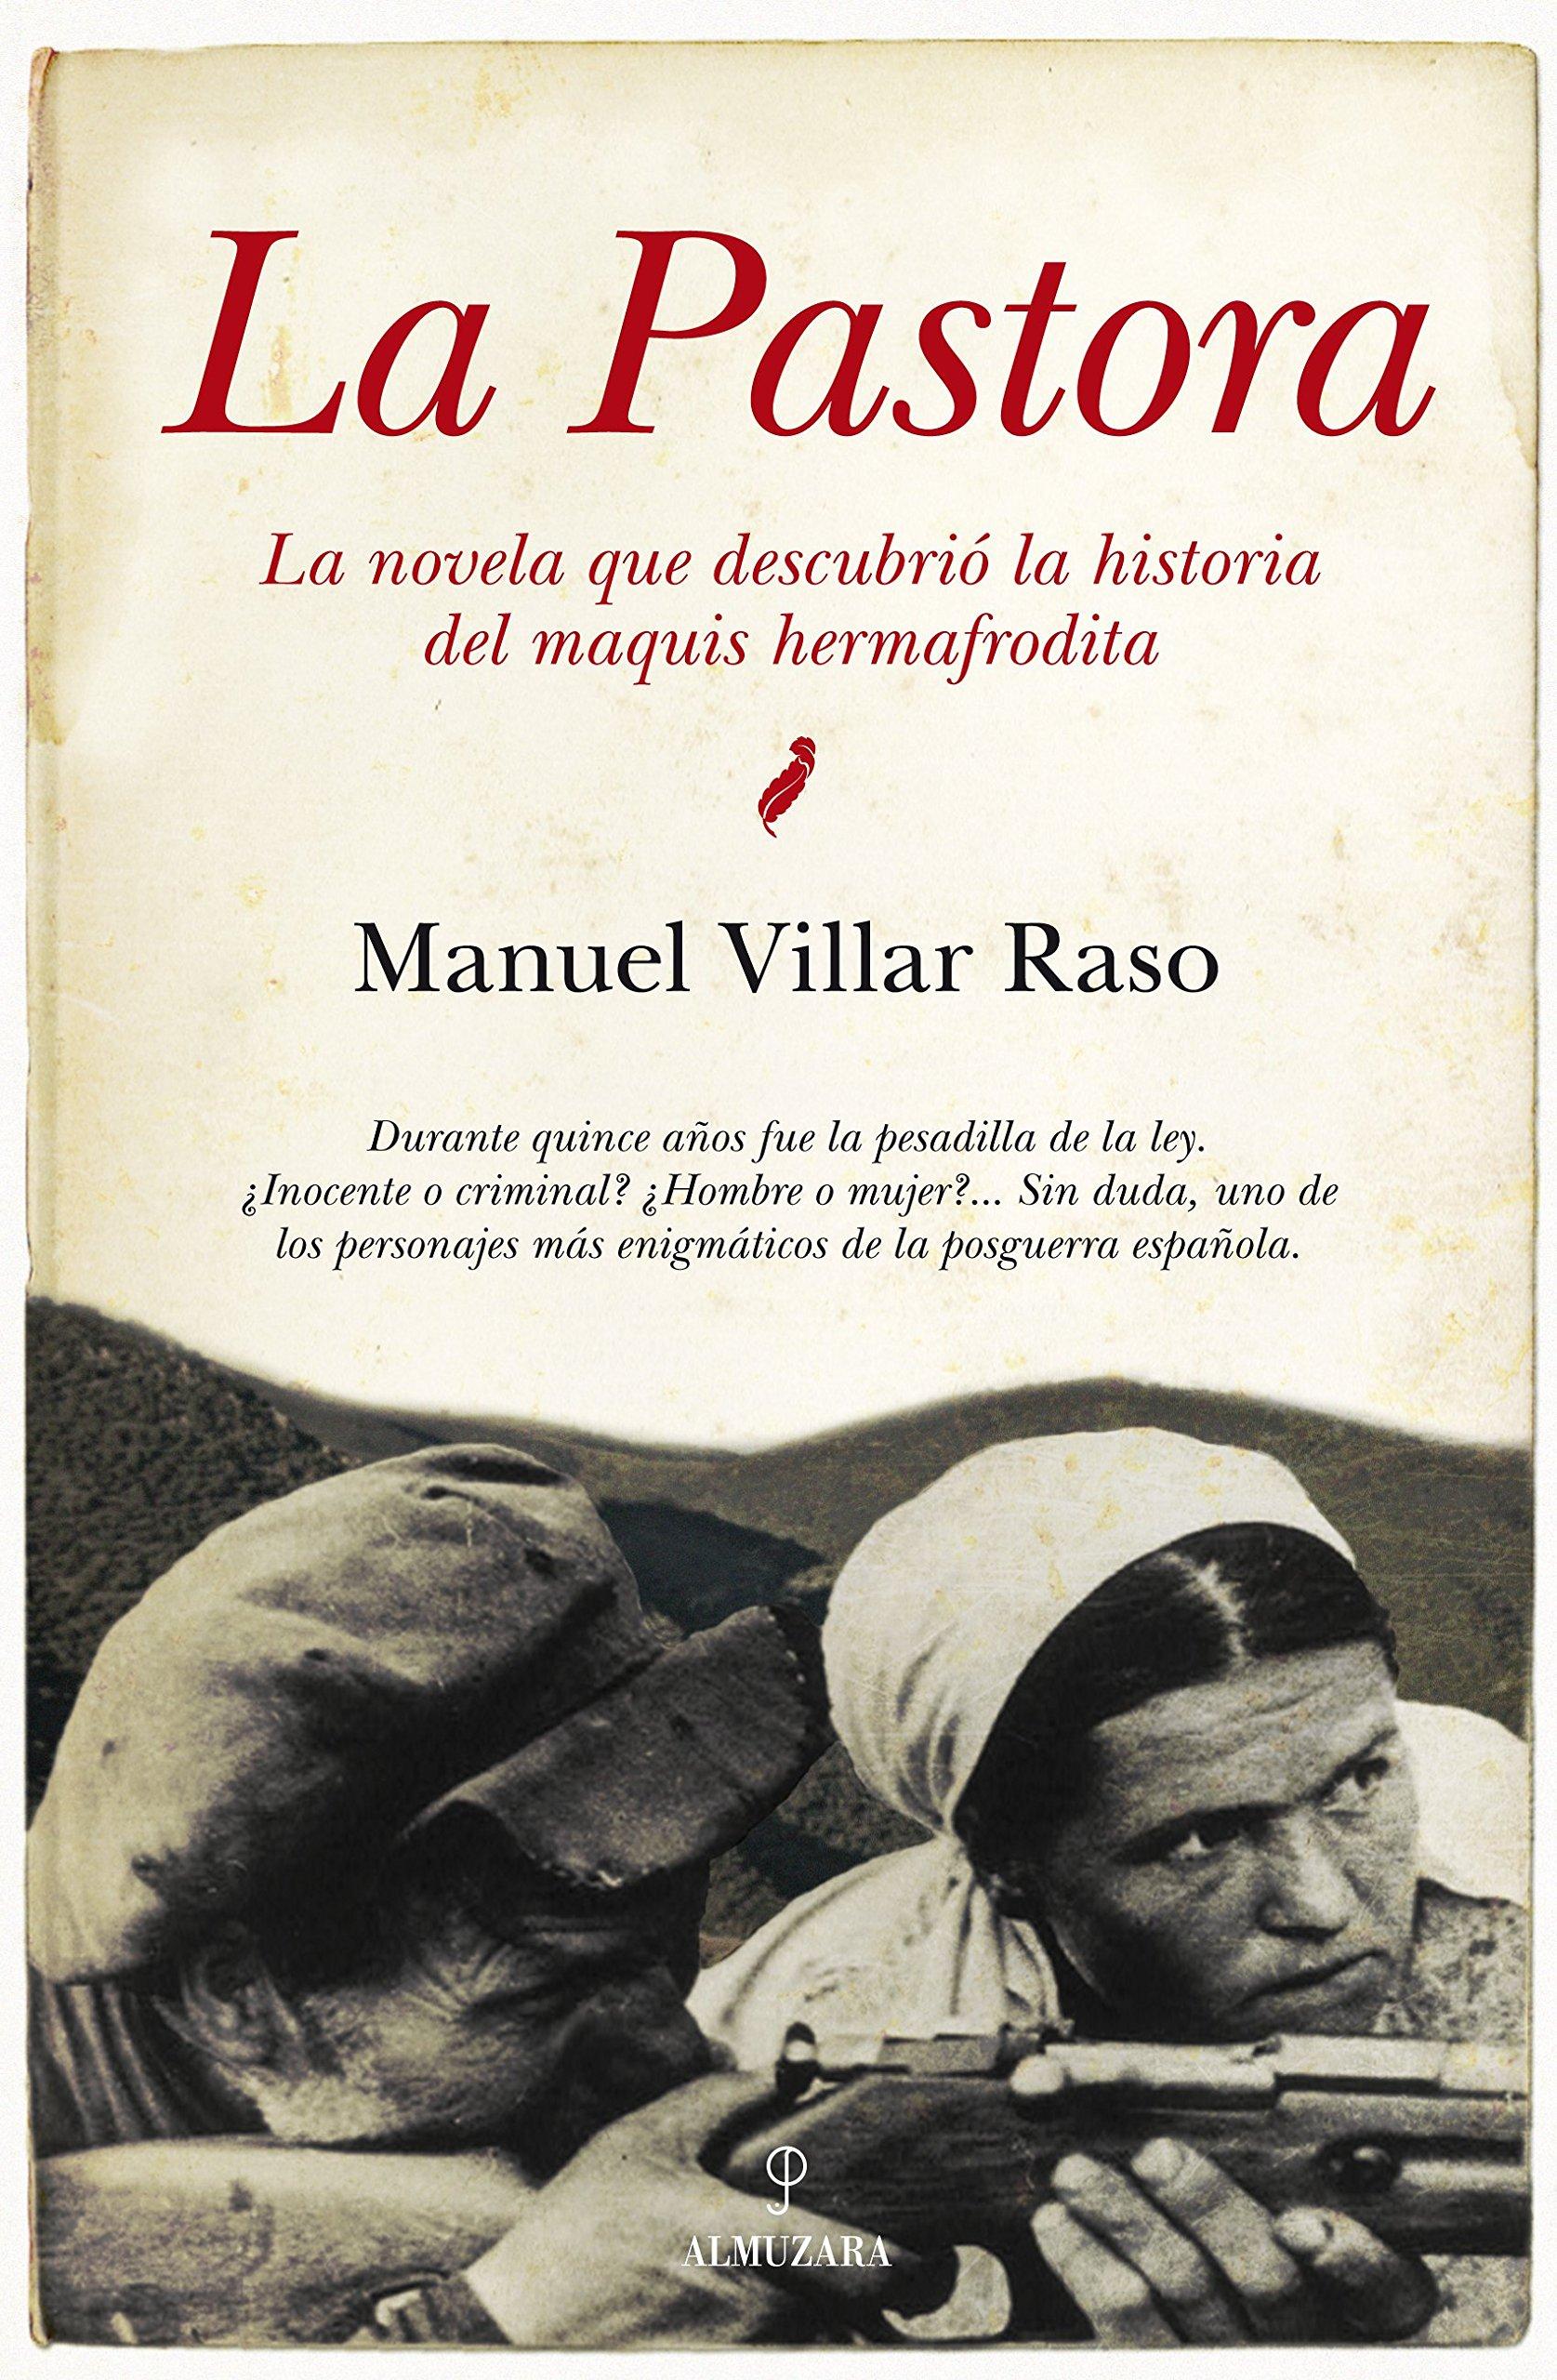 La Pastora: La novela que descubrió la historia del maquis hermafrodita Novela Historica: Amazon.es: Villar Raso, Manuel: Libros